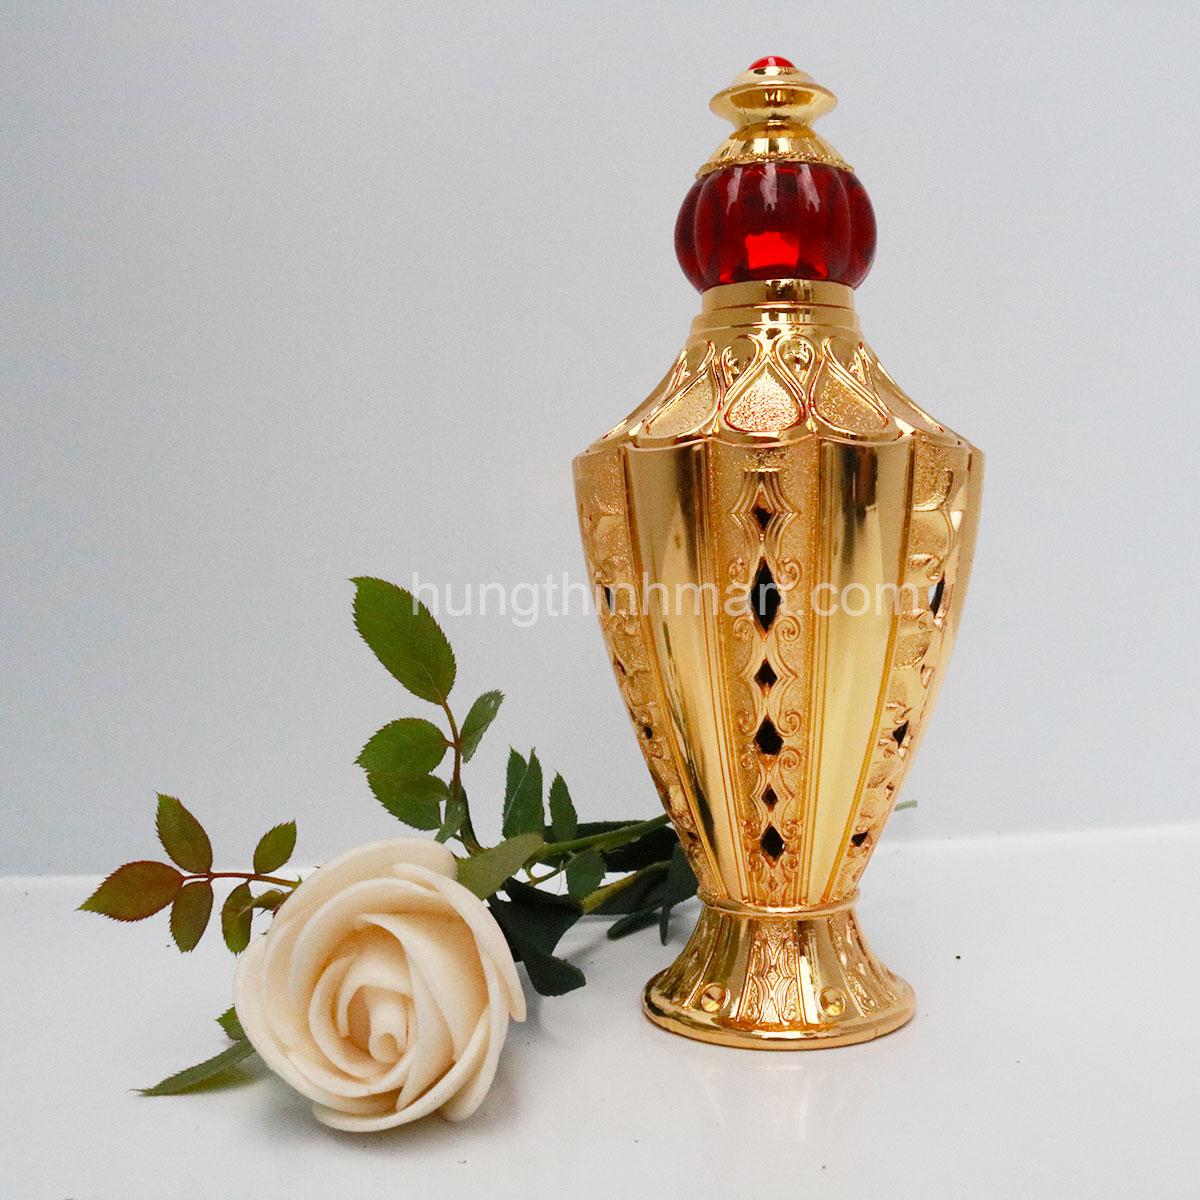 ruby-rose-1